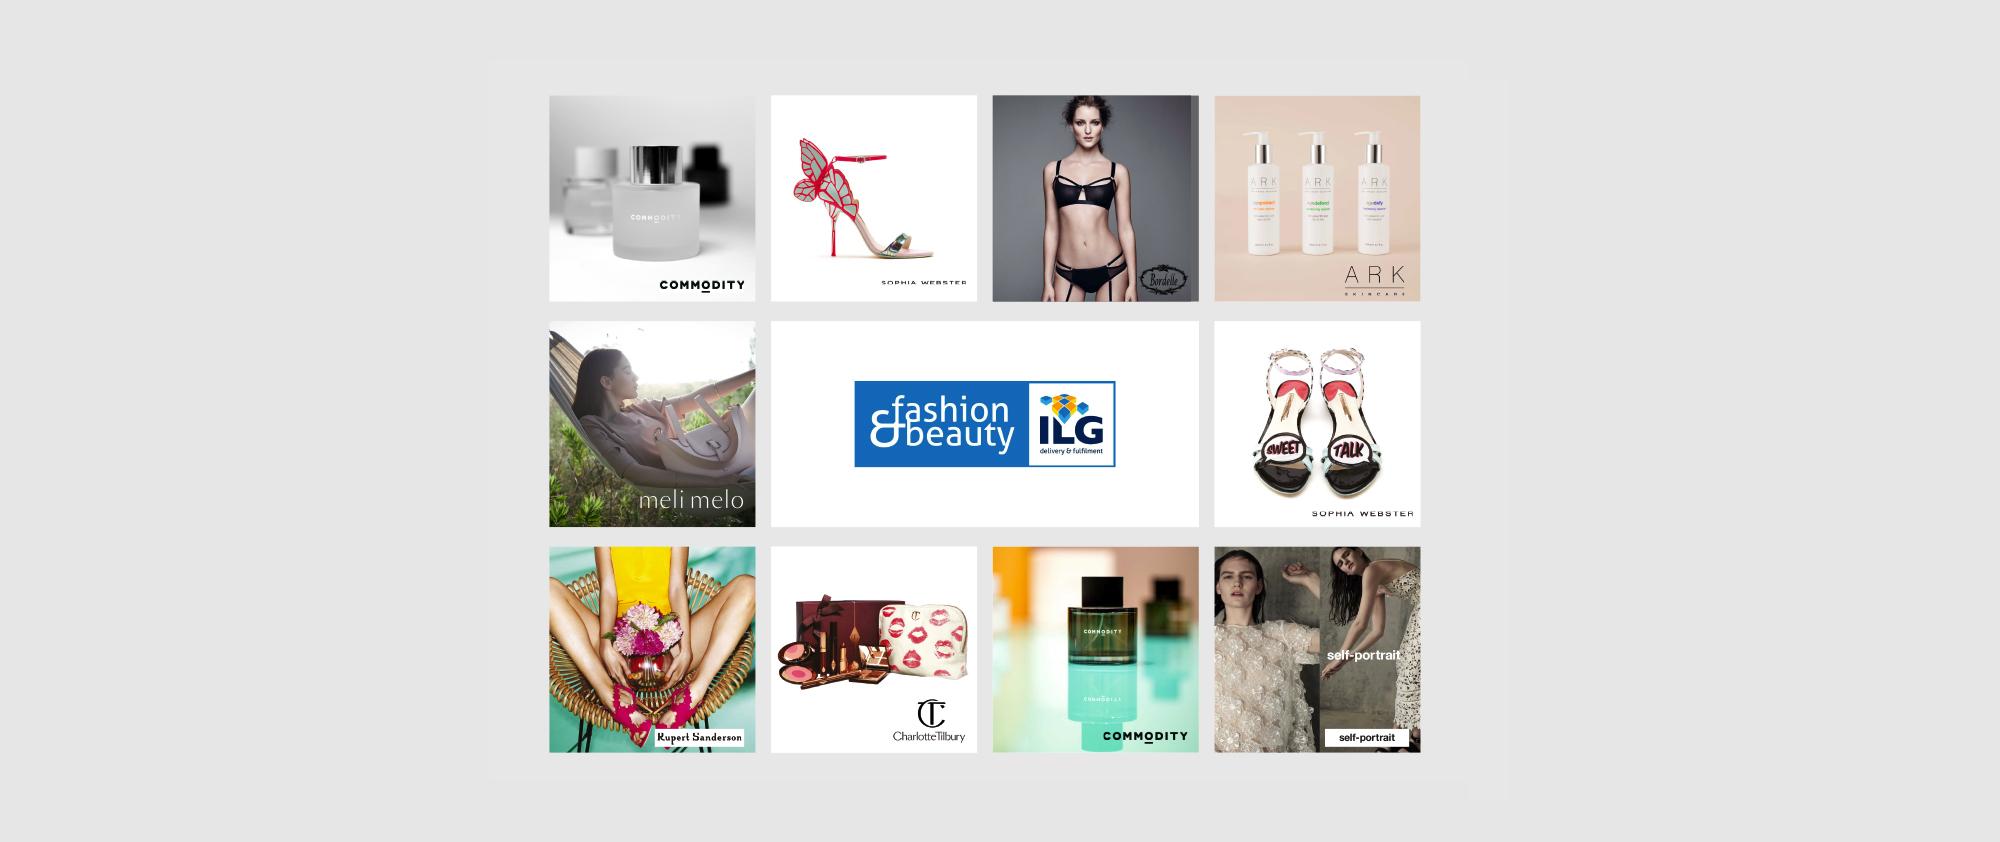 ILG fashion beauty wall graphics